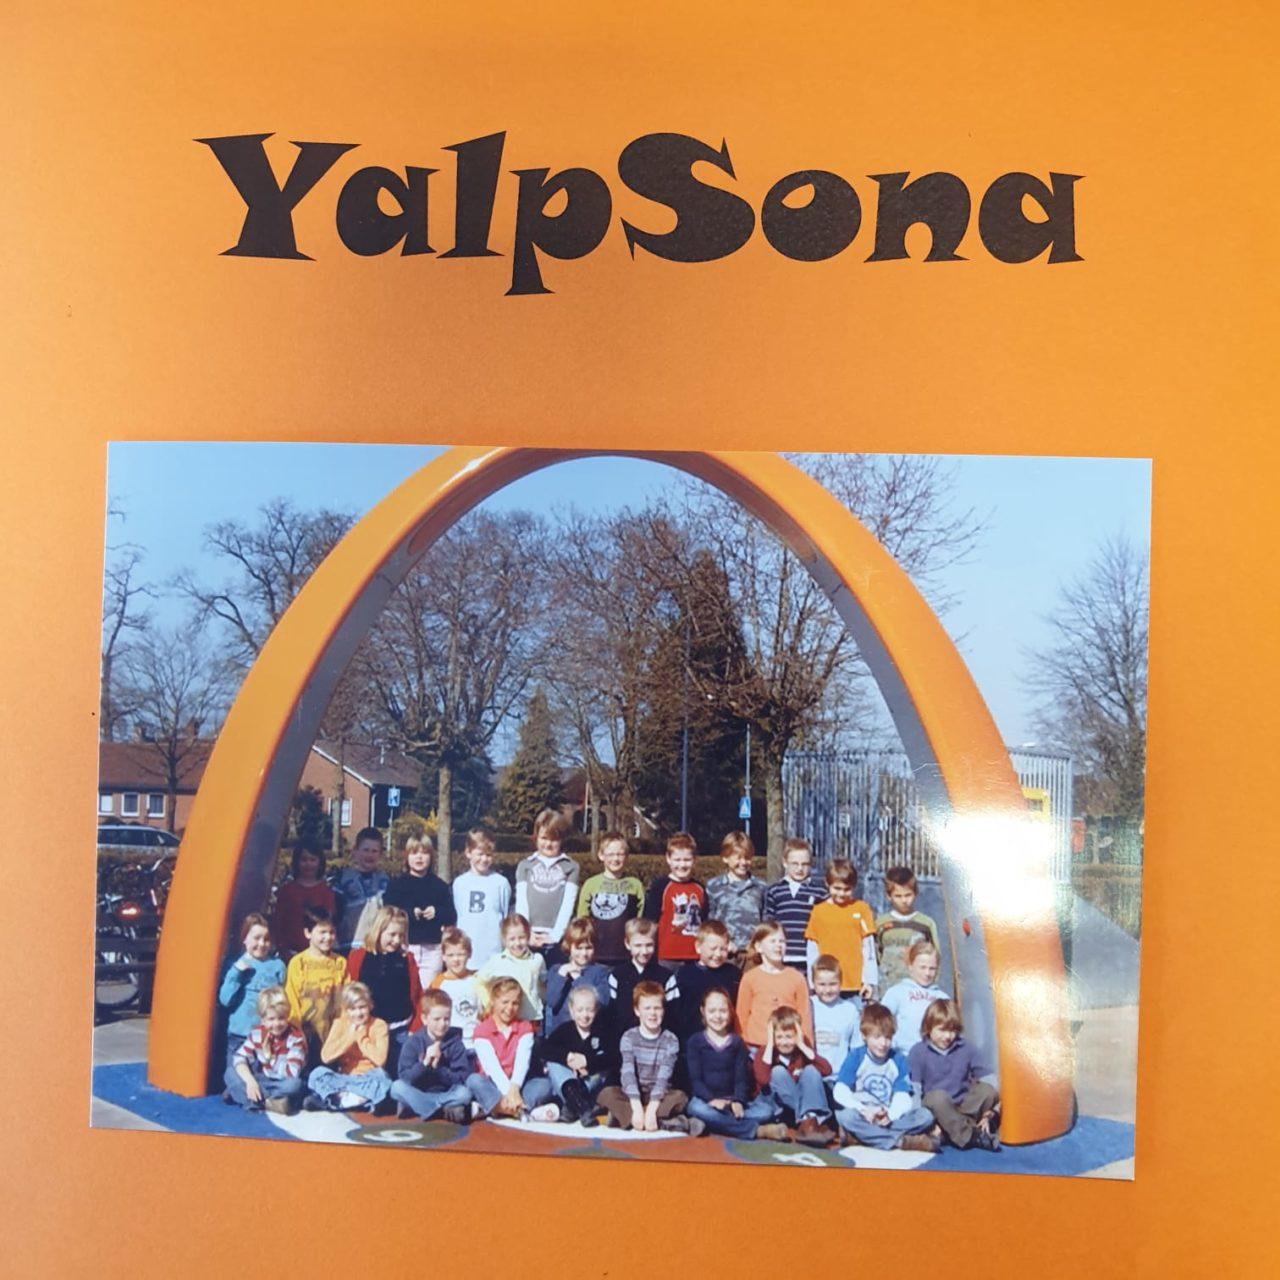 First Yalp Sona - Schoolyard Markelo